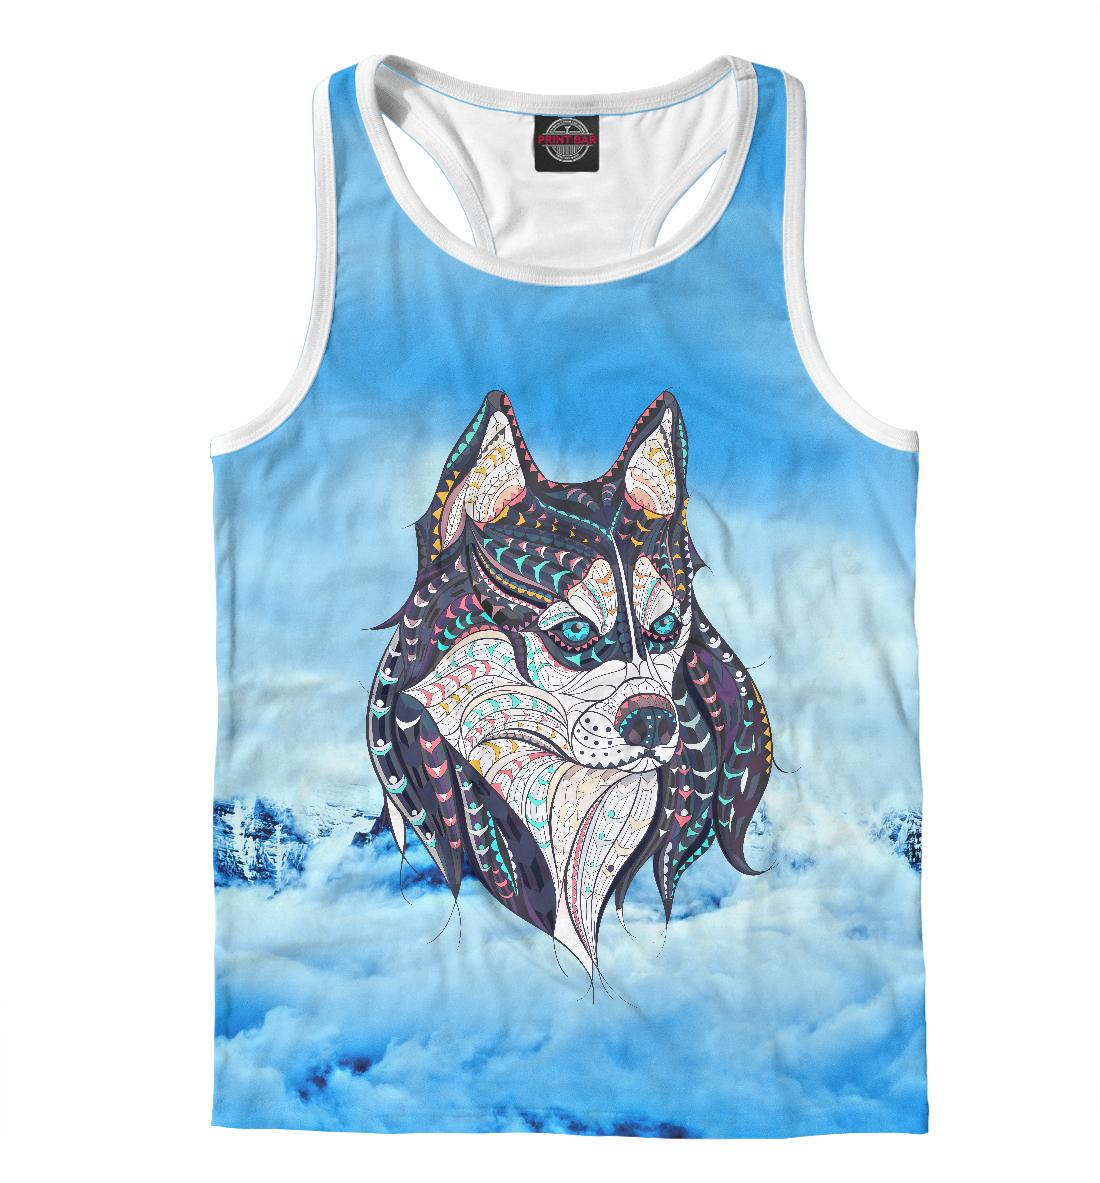 Купить Siberian Husky, Printbar, Майки борцовки, DOG-759984-mayb-2